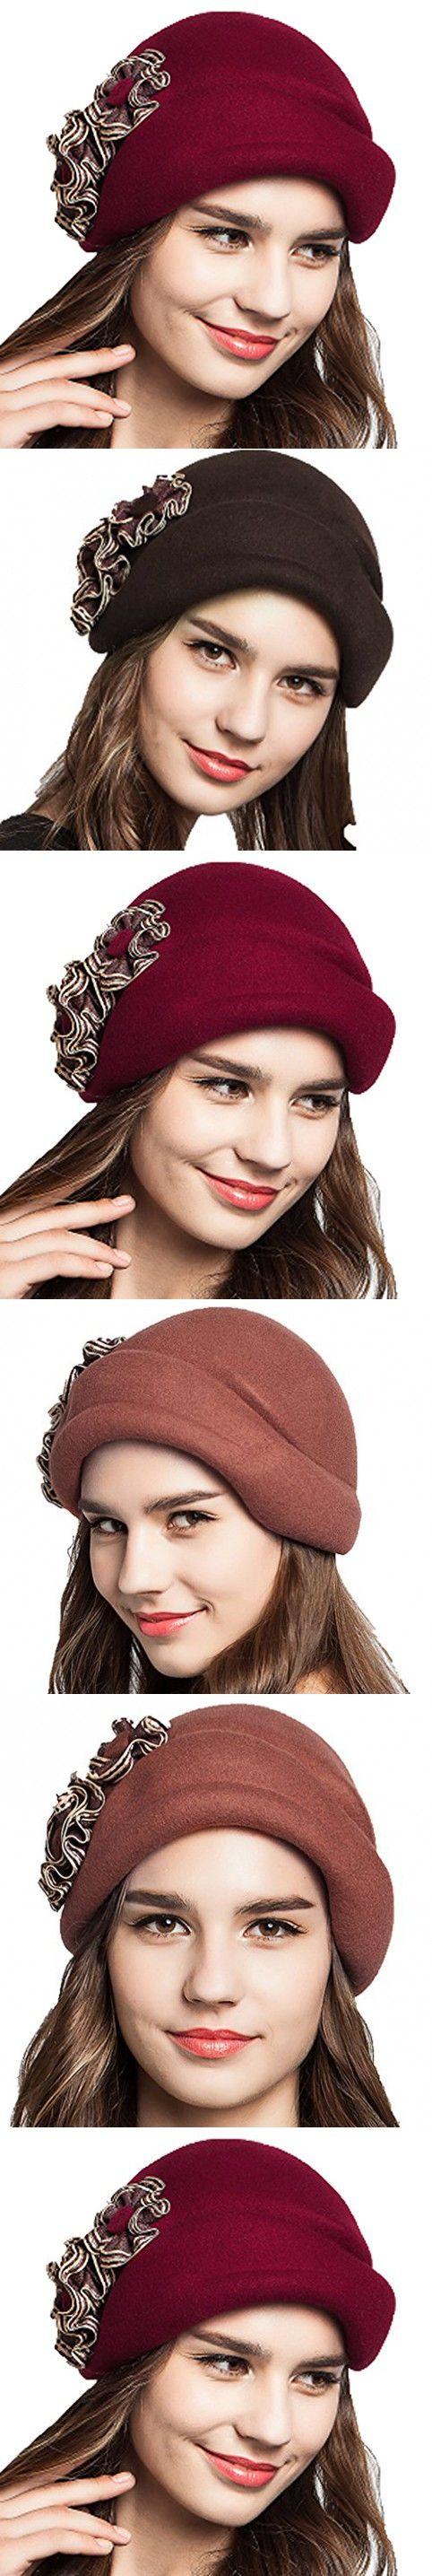 Supergirl Women hat Wool Beret Hat New Style Fashion Flower Homburg Hat Red